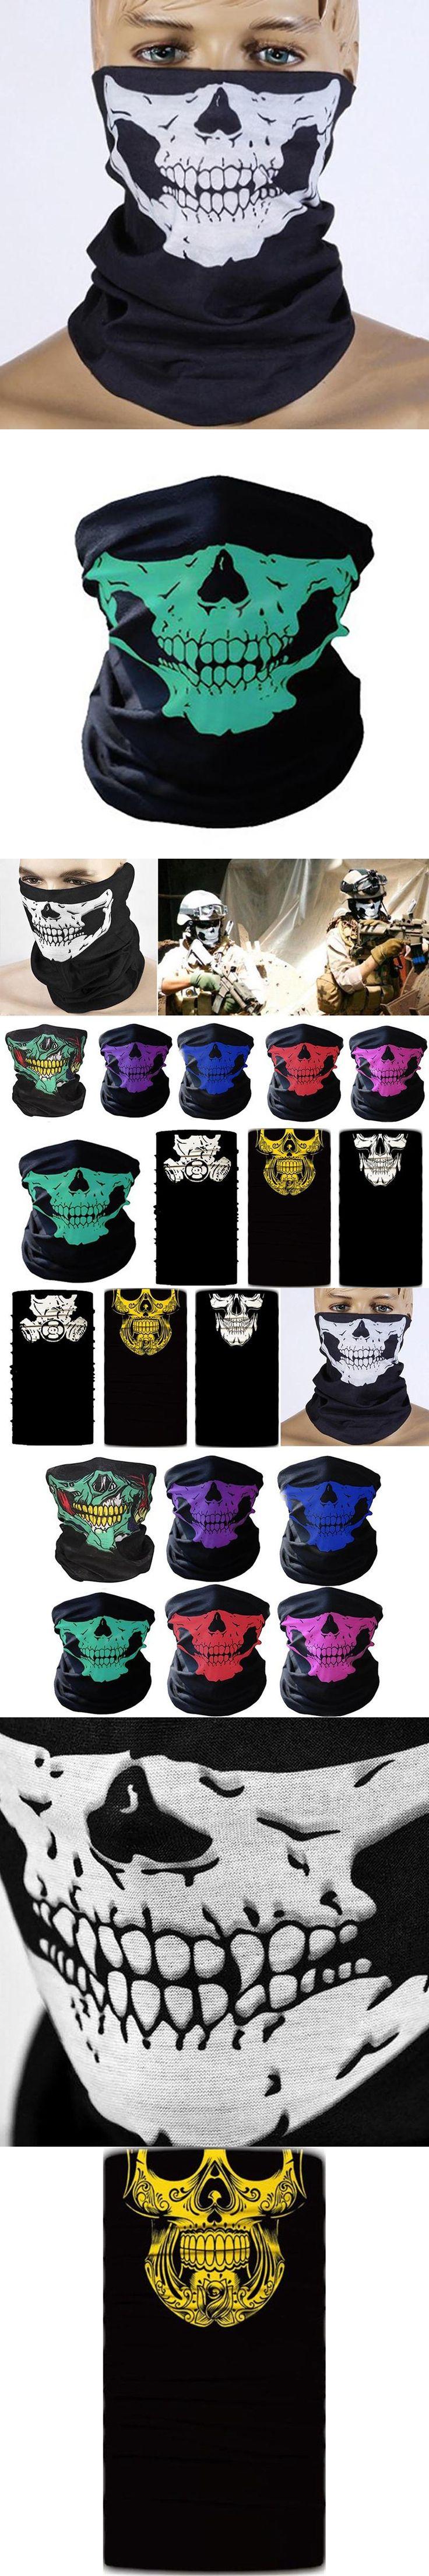 Mayitr Skull Face Mask Beanie Scarf Dust Mask Helmet Neck Paintball Bandana Halloween Outdoor Tactical Face Mask 10 Colors